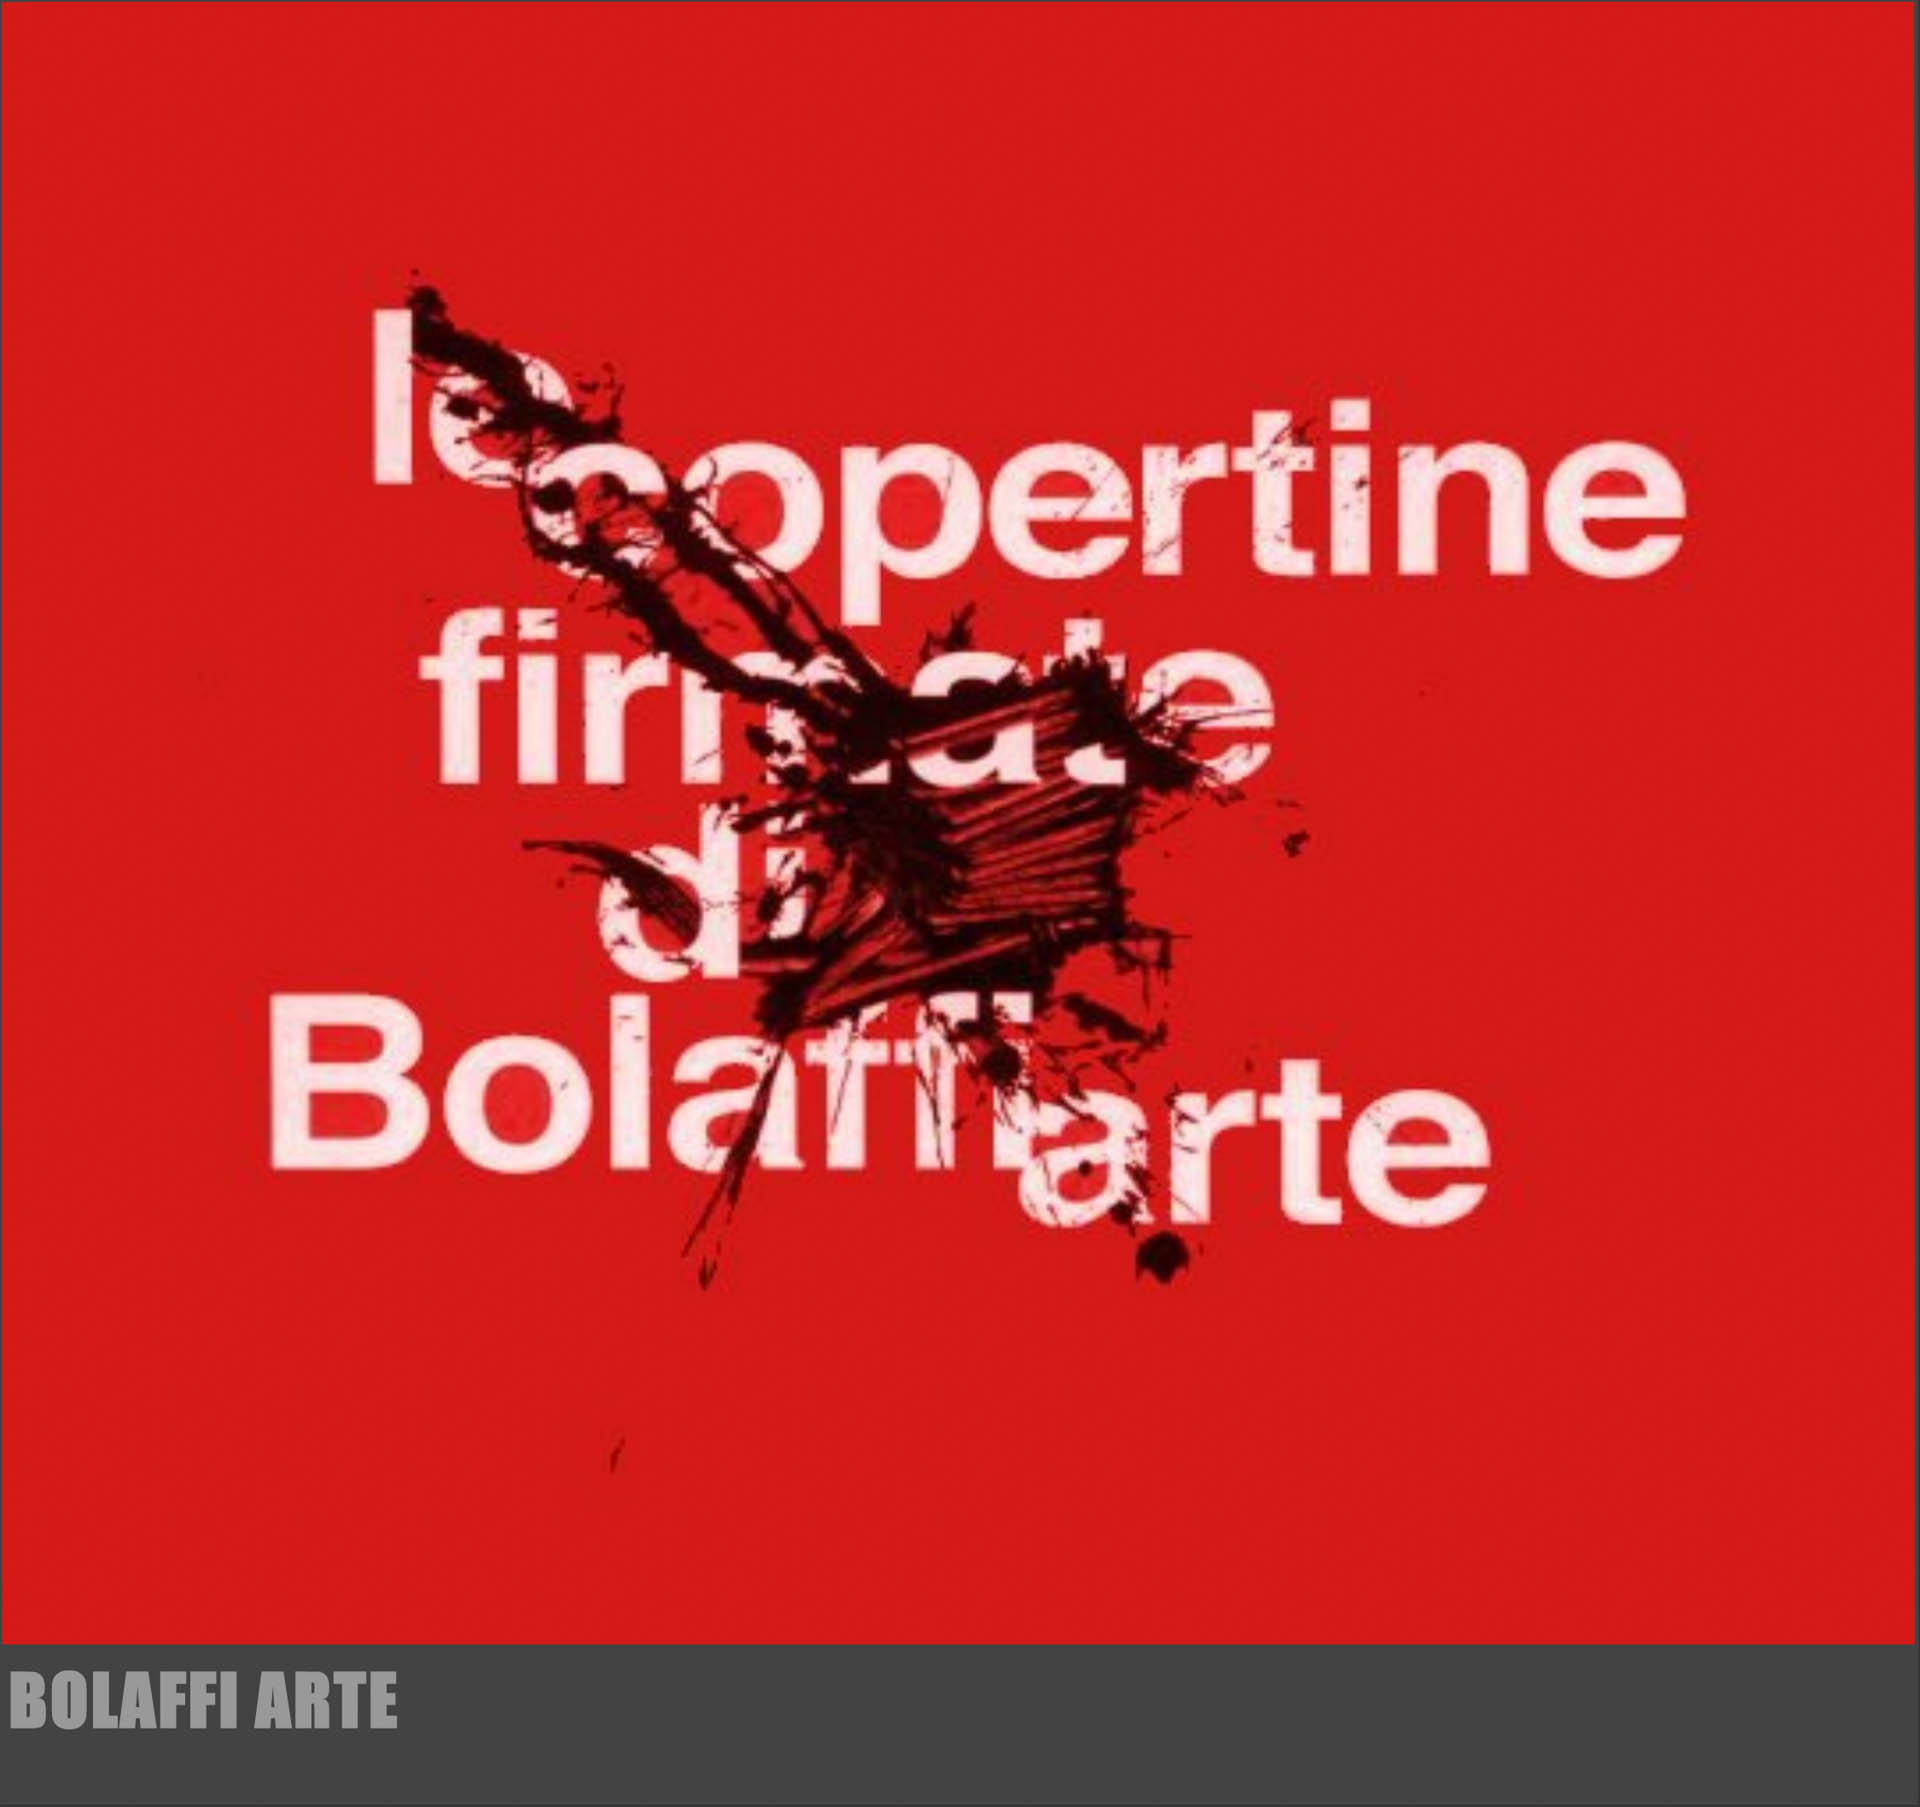 050215_0_bolaffi_1